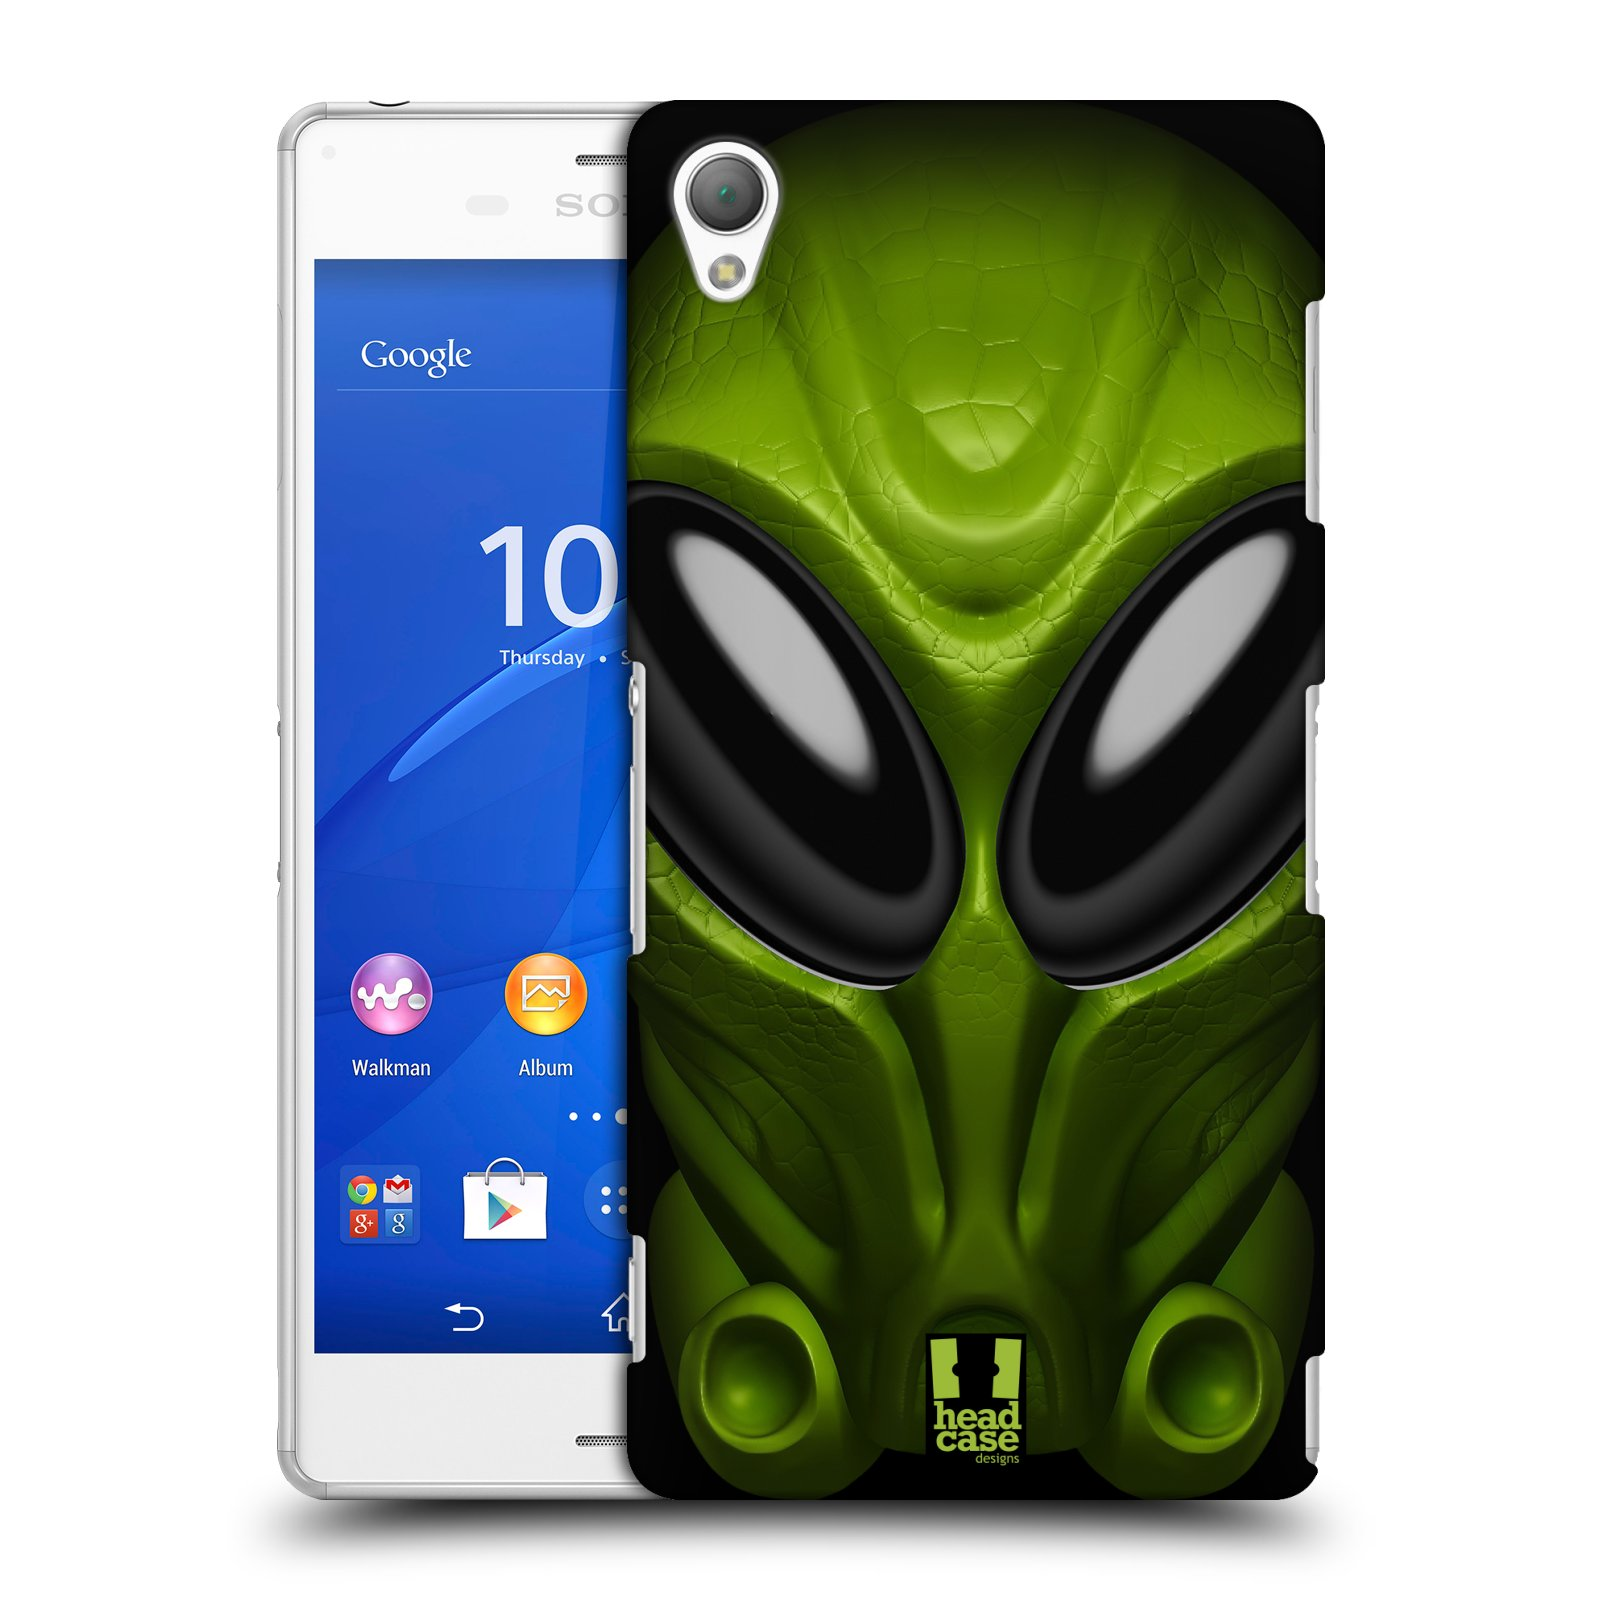 Plastové pouzdro na mobil Sony Xperia Z3 D6603 - Head Case - Ufoun Mastermind (Plastový kryt či obal na mobilní telefon s motivem Ufouna Masterminda pro Sony Xperia Z3)